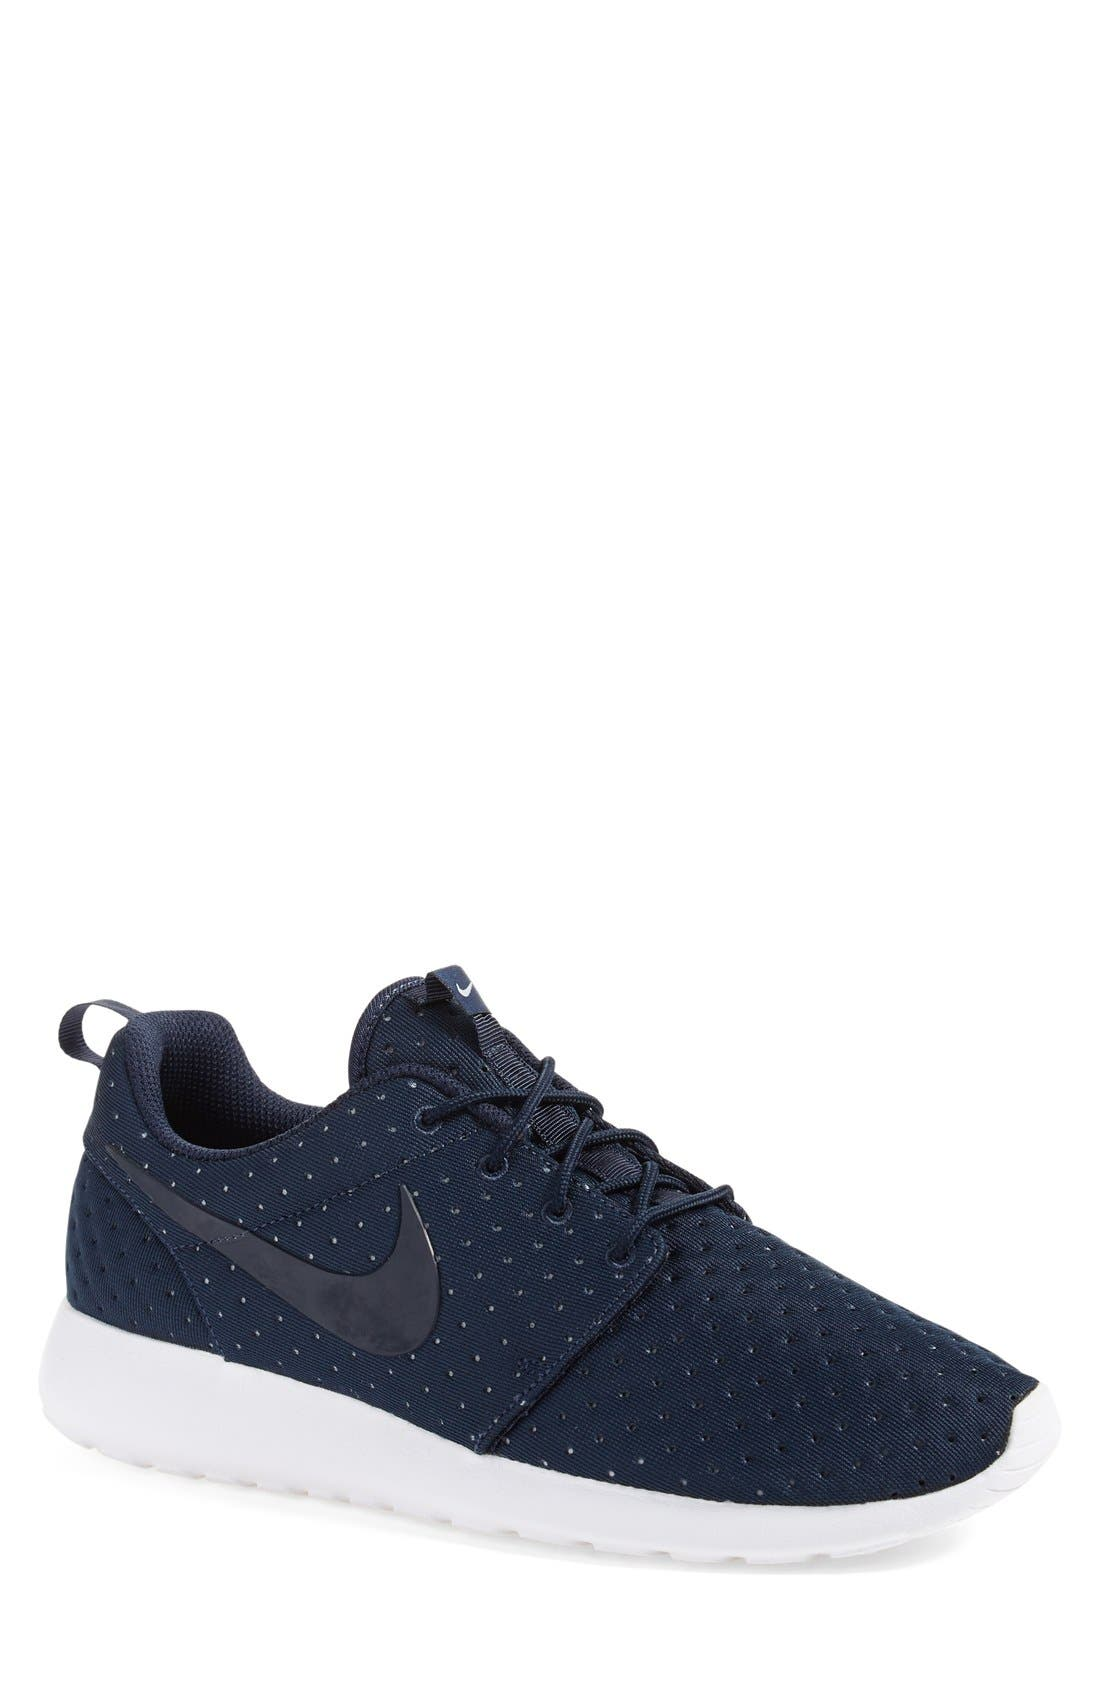 'Roshe One SE' Sneaker,                         Main,                         color, Obsidian/ Obsidian/ Grey